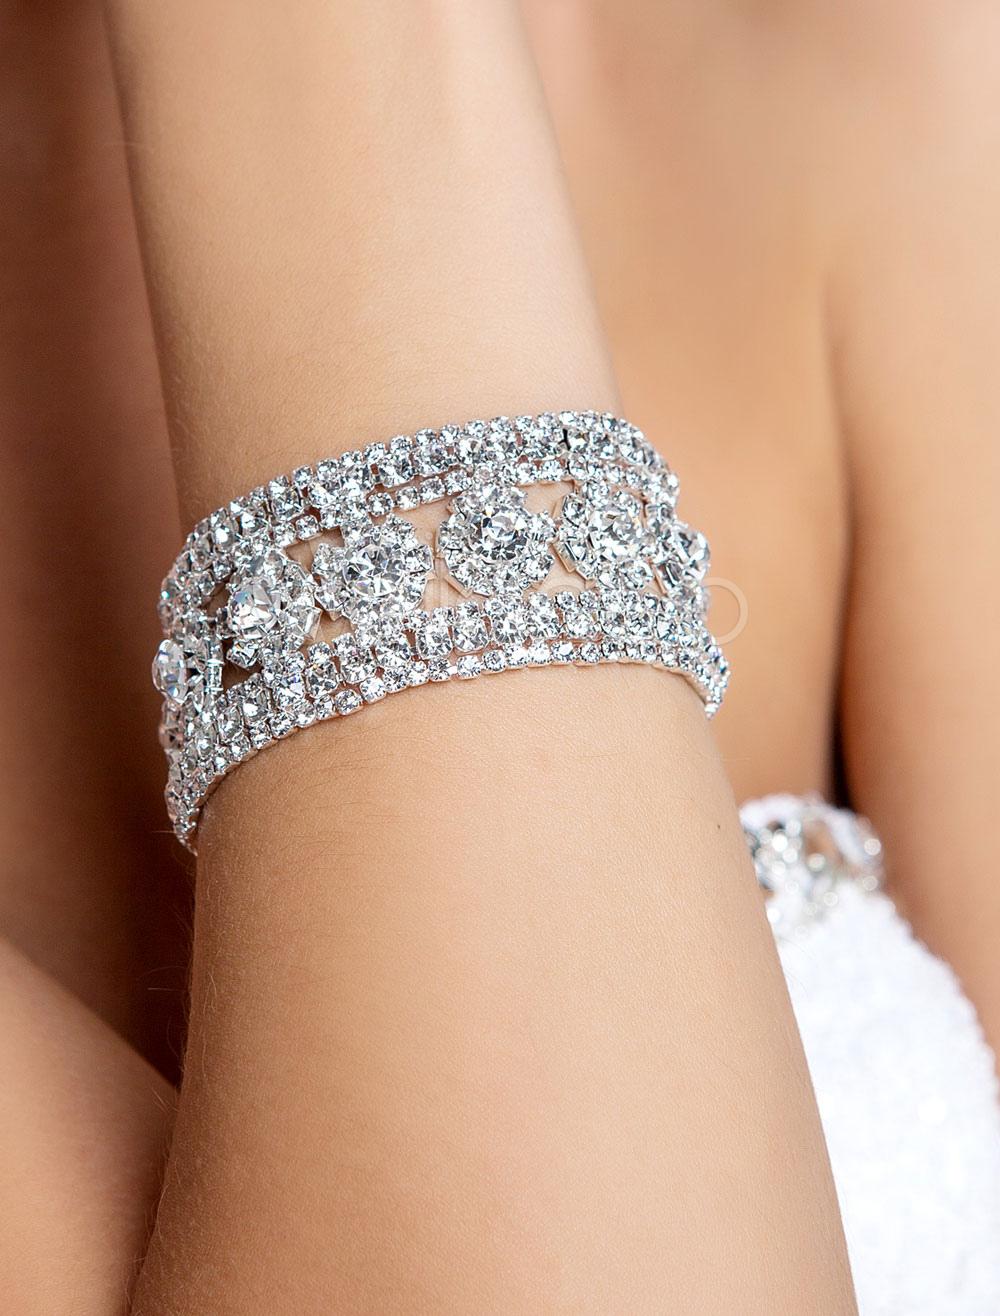 stilvolle juwelen f r besondere anl sse braut juwelen. Black Bedroom Furniture Sets. Home Design Ideas